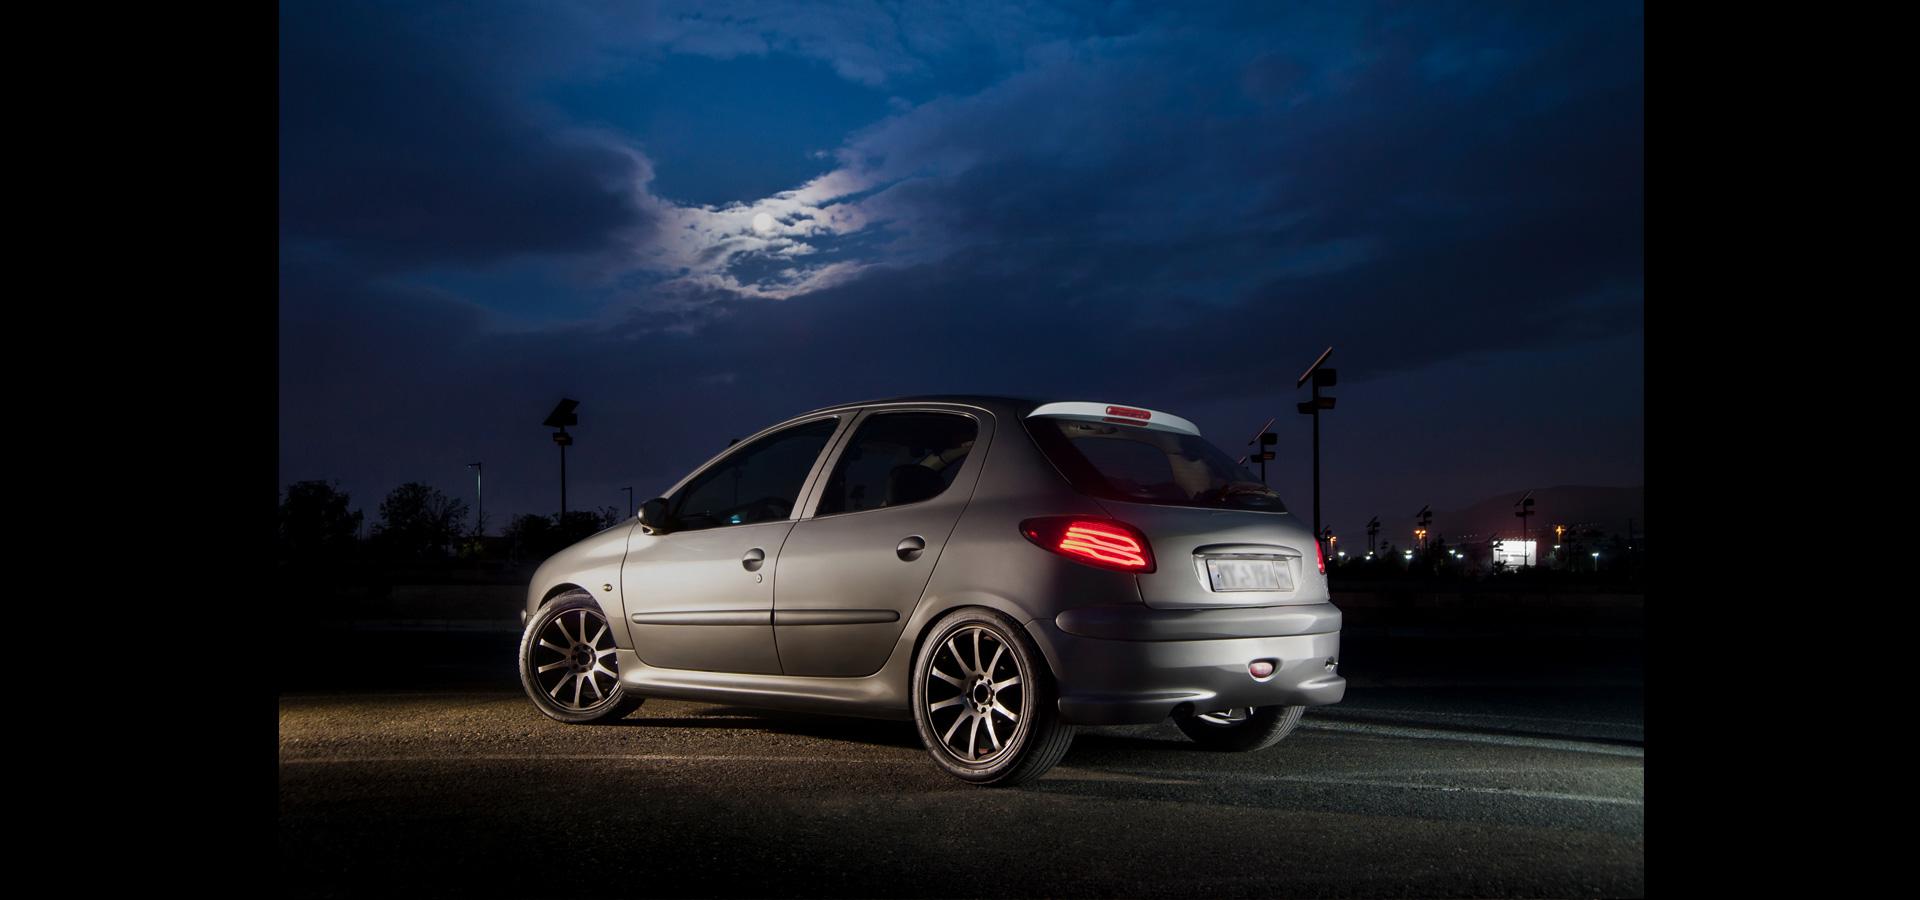 عکاسی صنعتی خودرو